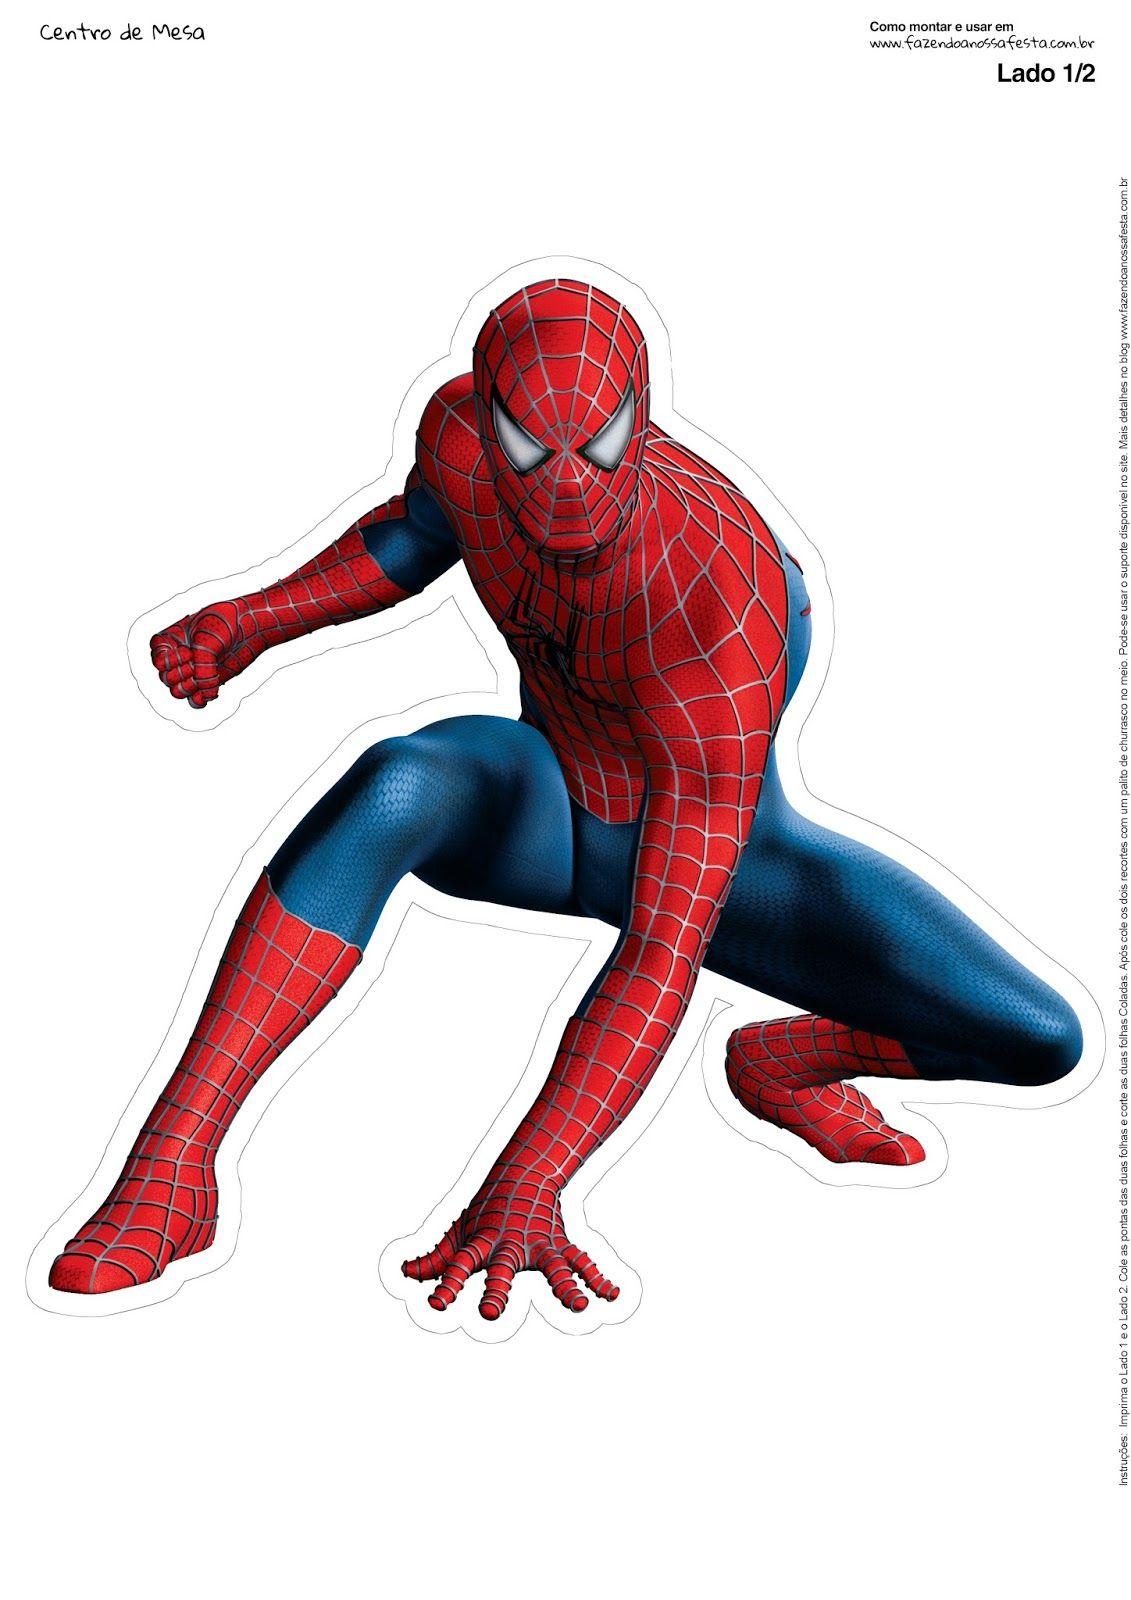 Spiderman: Centros de Mesa para Imprimir Gratis. | patrulla canina ...